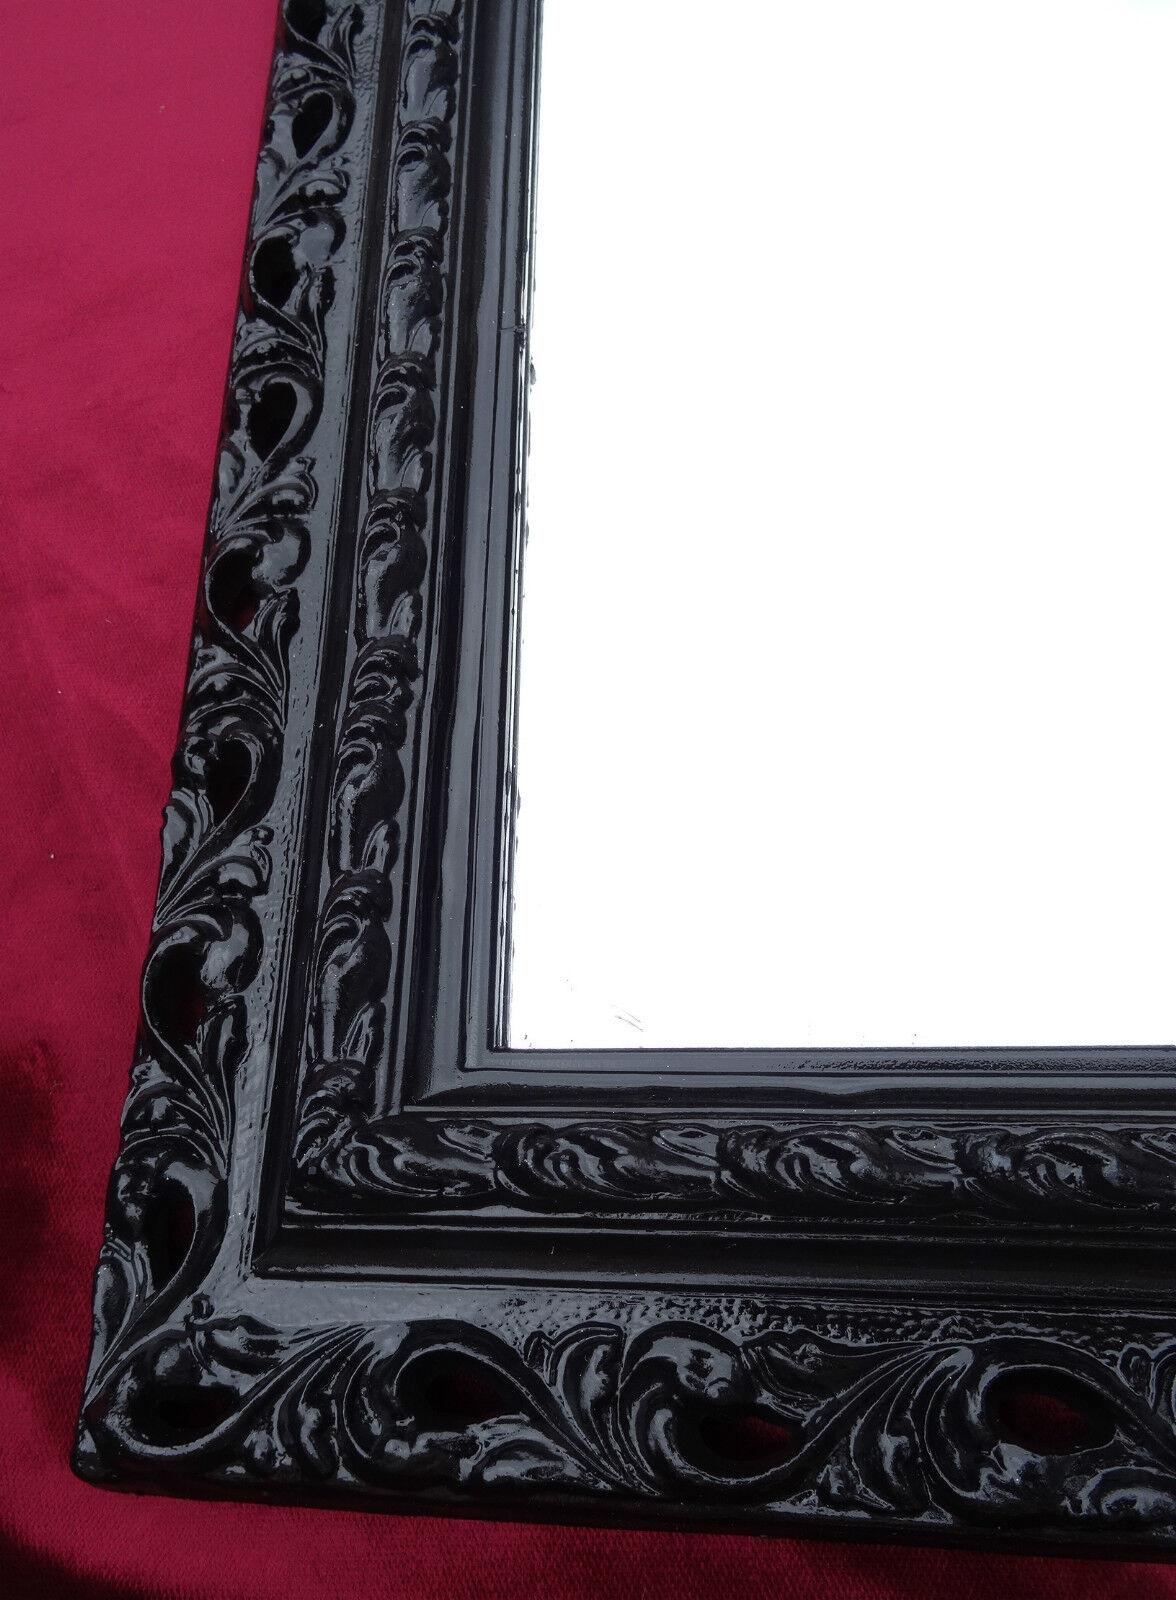 Miroir Mural 43x36 Miroir Baroque Rectangulaire Noir Cadre Photo Arabesco 4